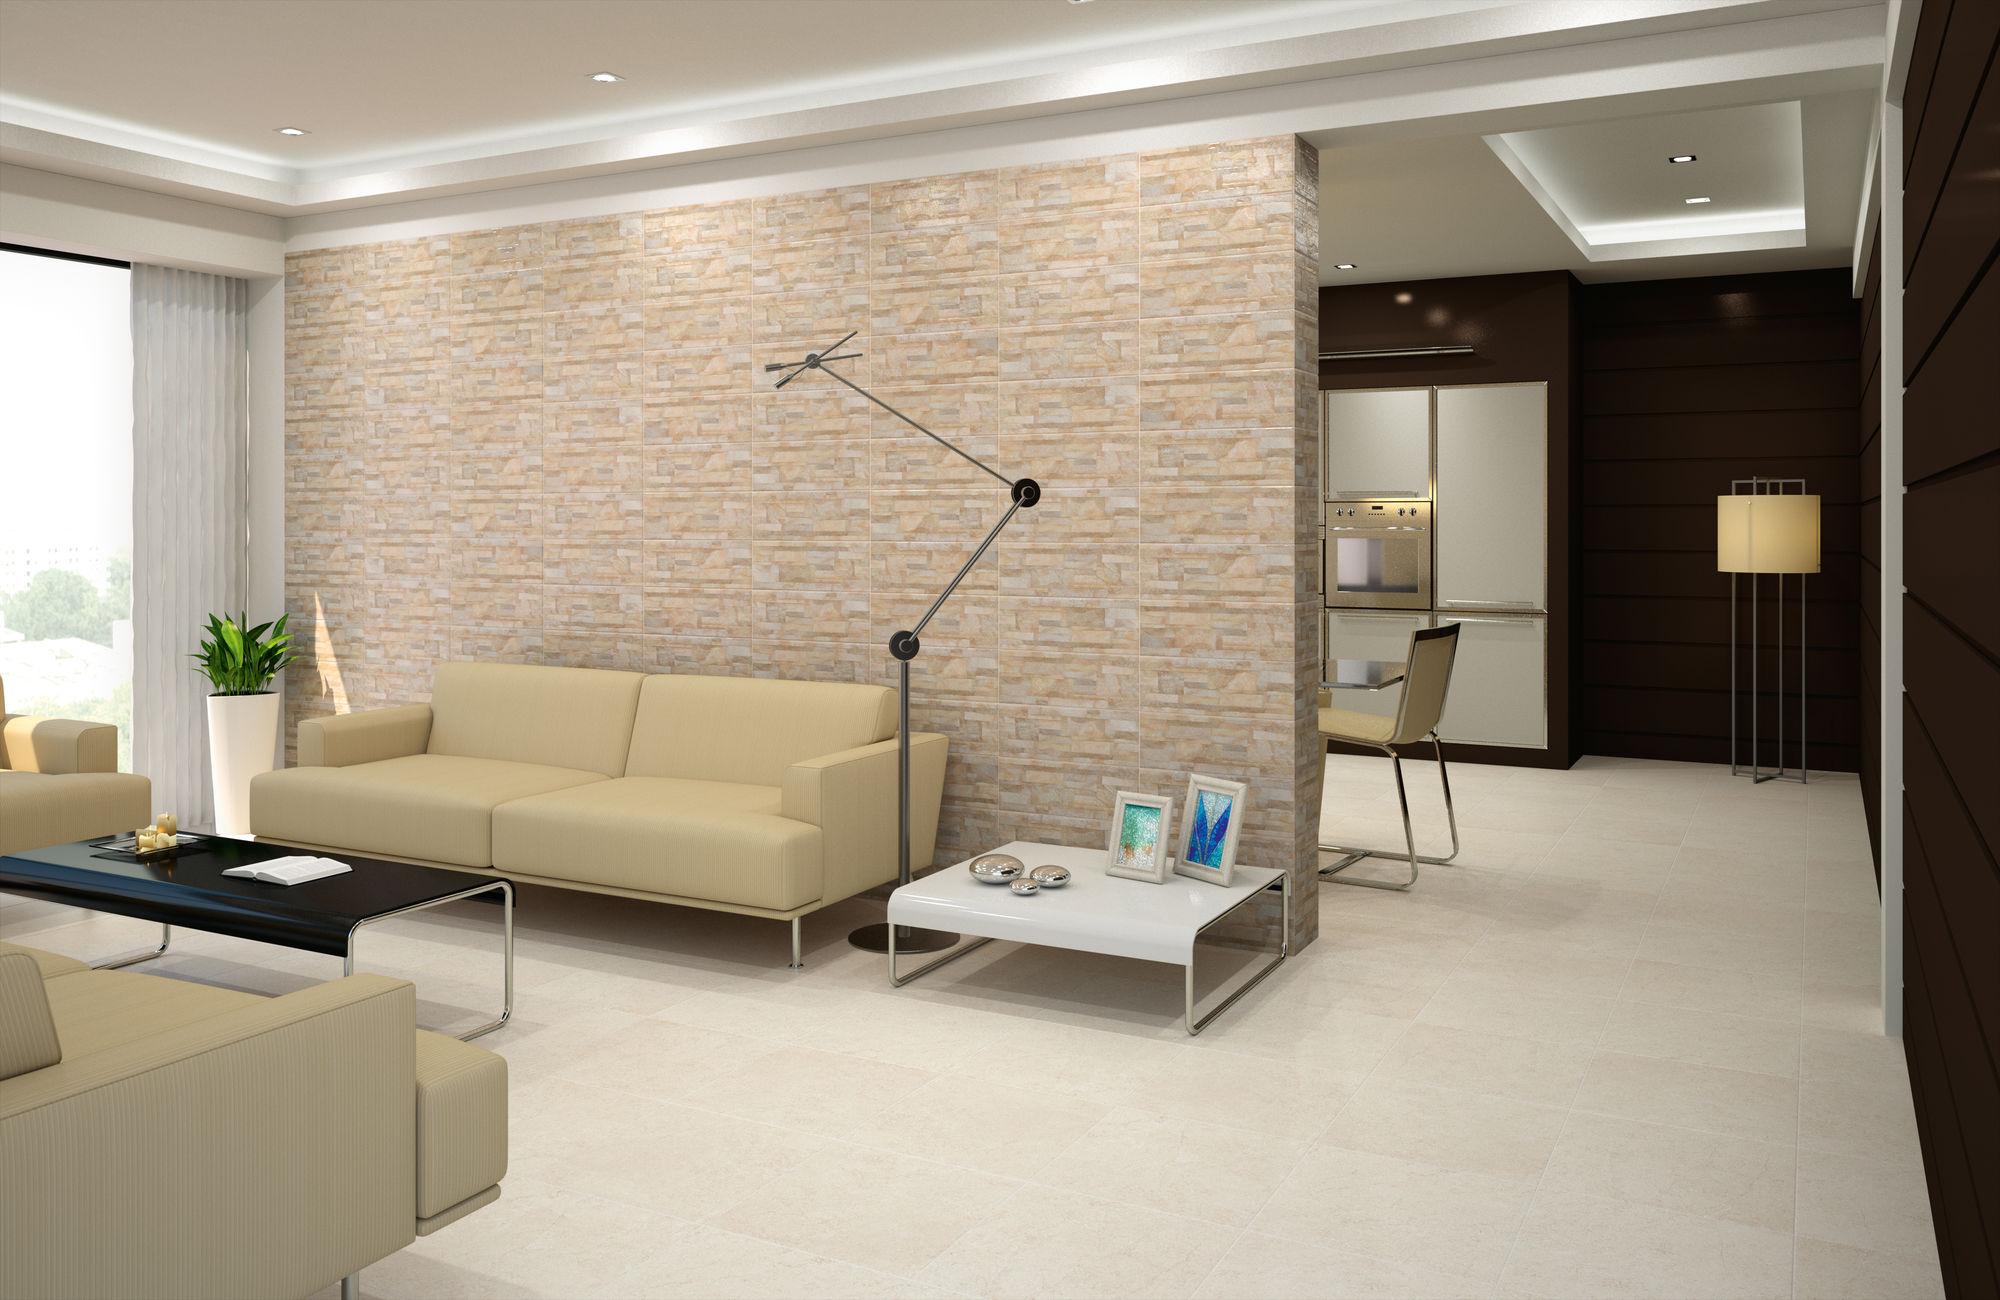 Brick Nepal Beige 17,5 x 50 cm. Pavimento Concrete Bone 44,7 x 44,7 cm.